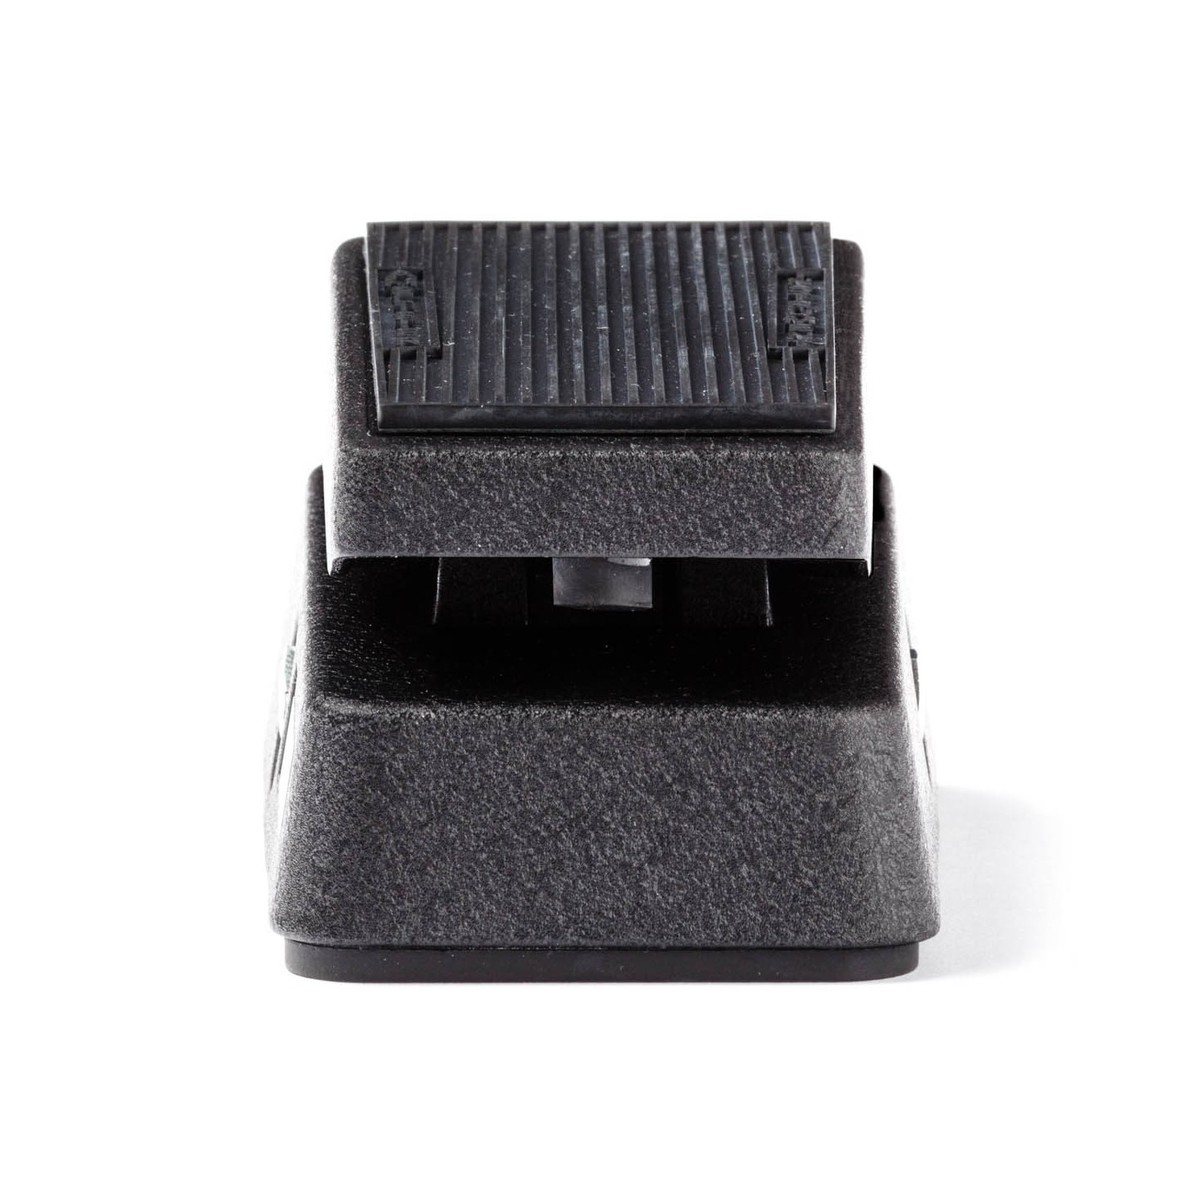 Hyt Over Oslo Jen Wah Vox V846 Layout Forstyrresel I Elektroyttbalansenr Jim Dunlop Cry Baby Mini Pedal Back Tile Types Prices